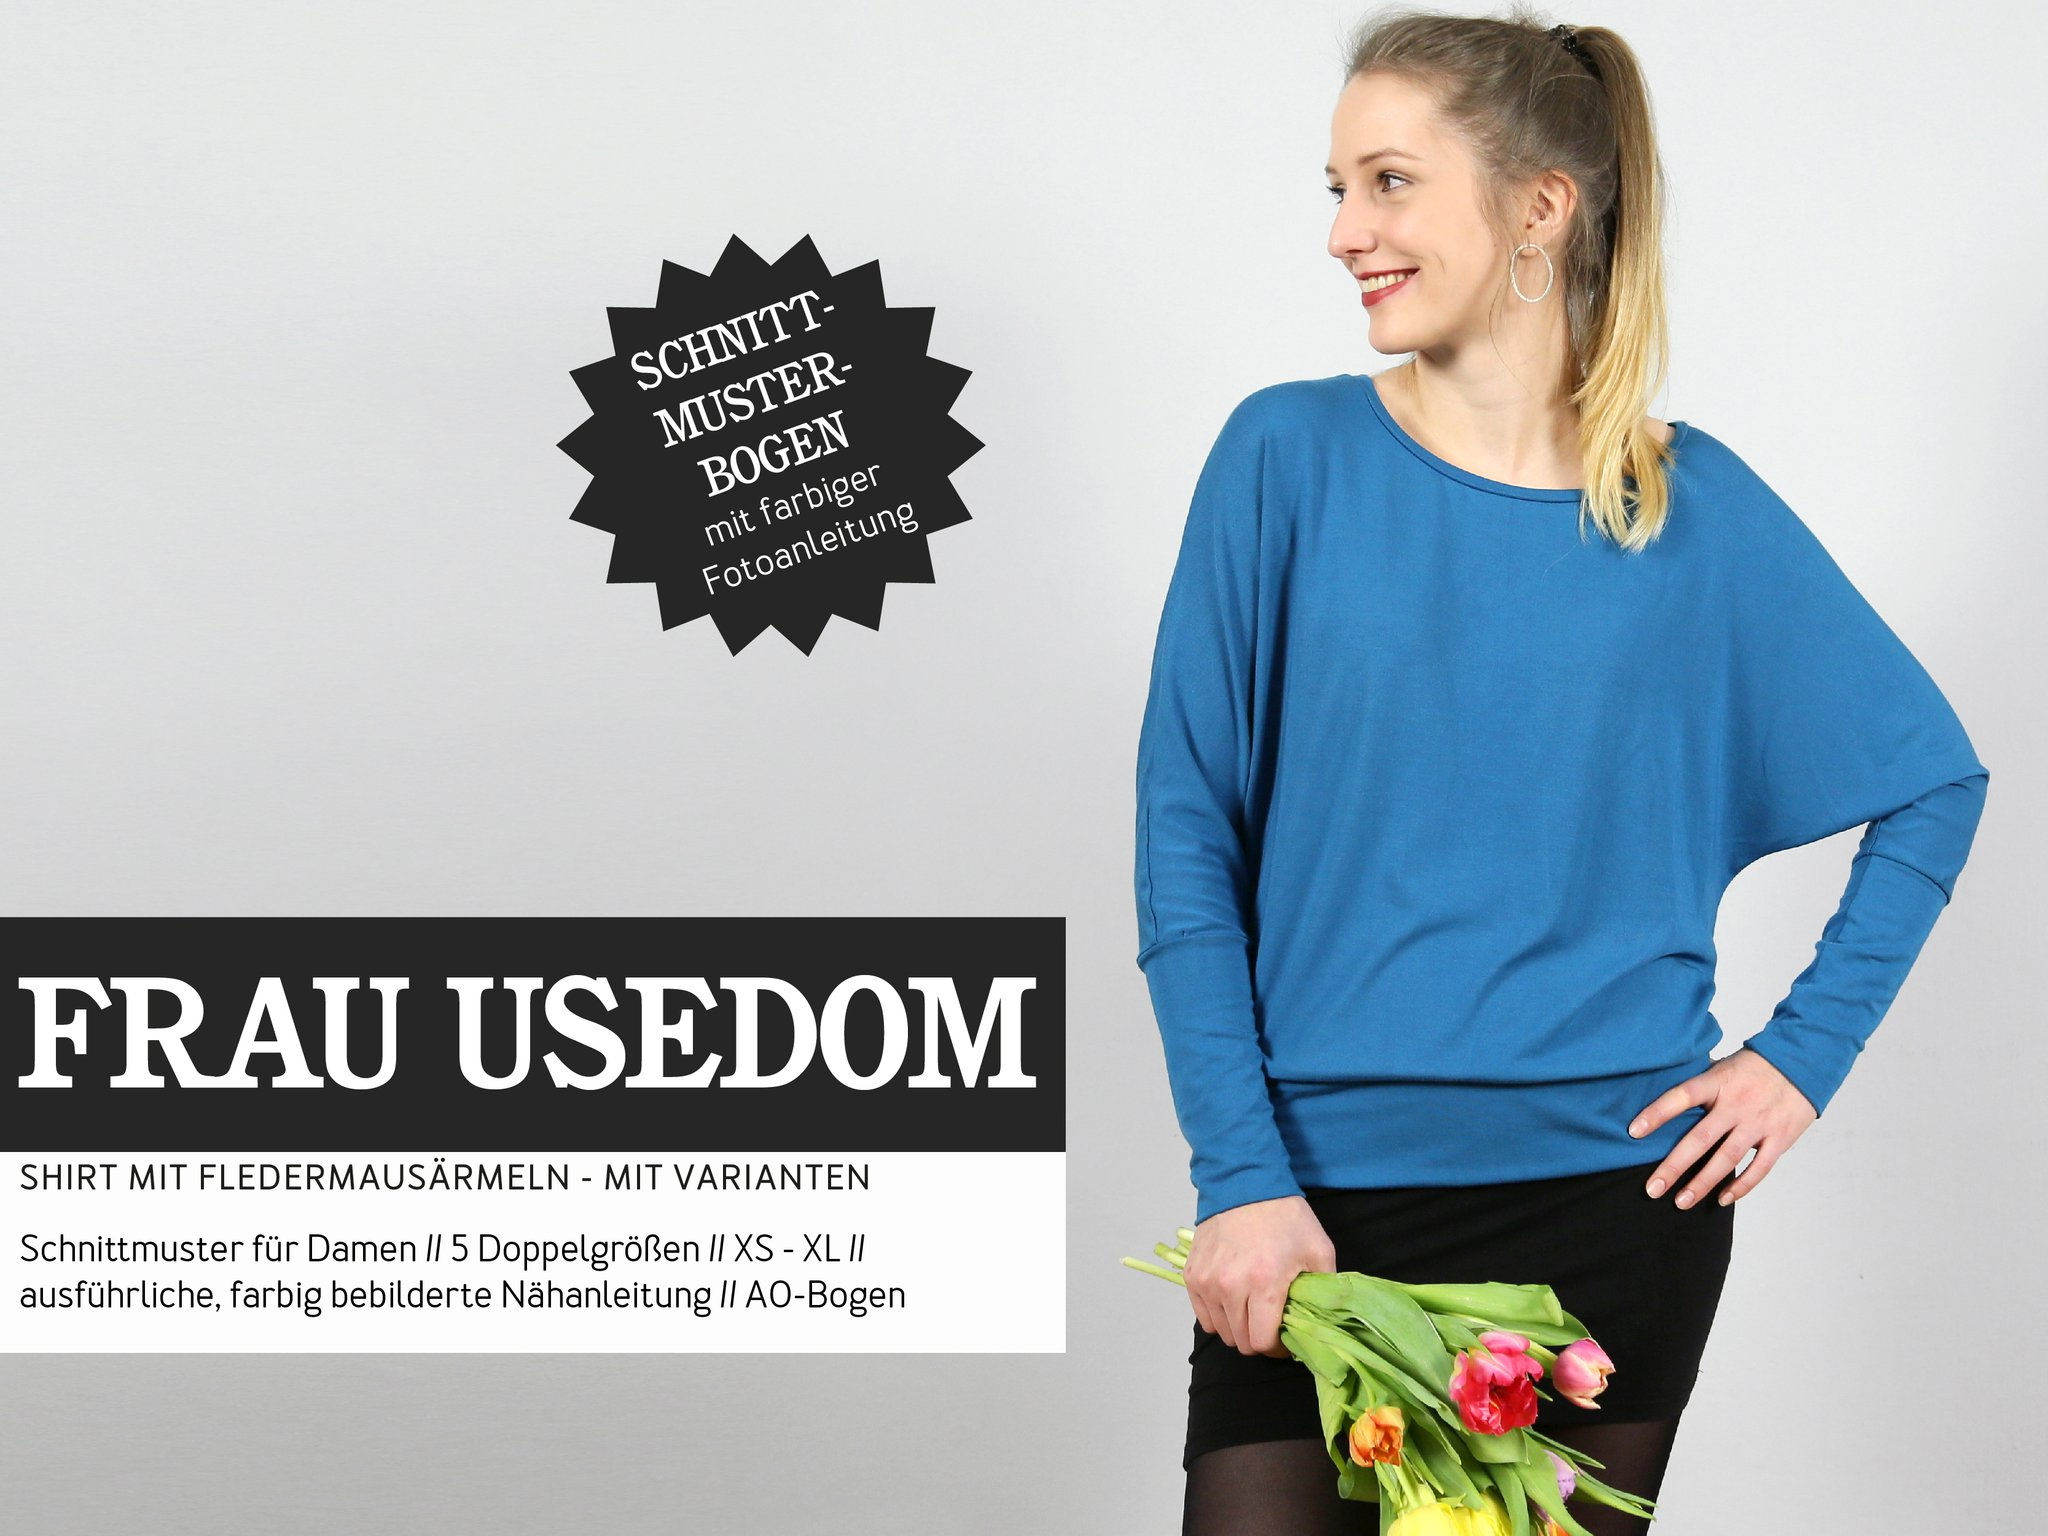 STUDIO SCHNITTREIF Frau Usedom Bluse Papierschnittmuster